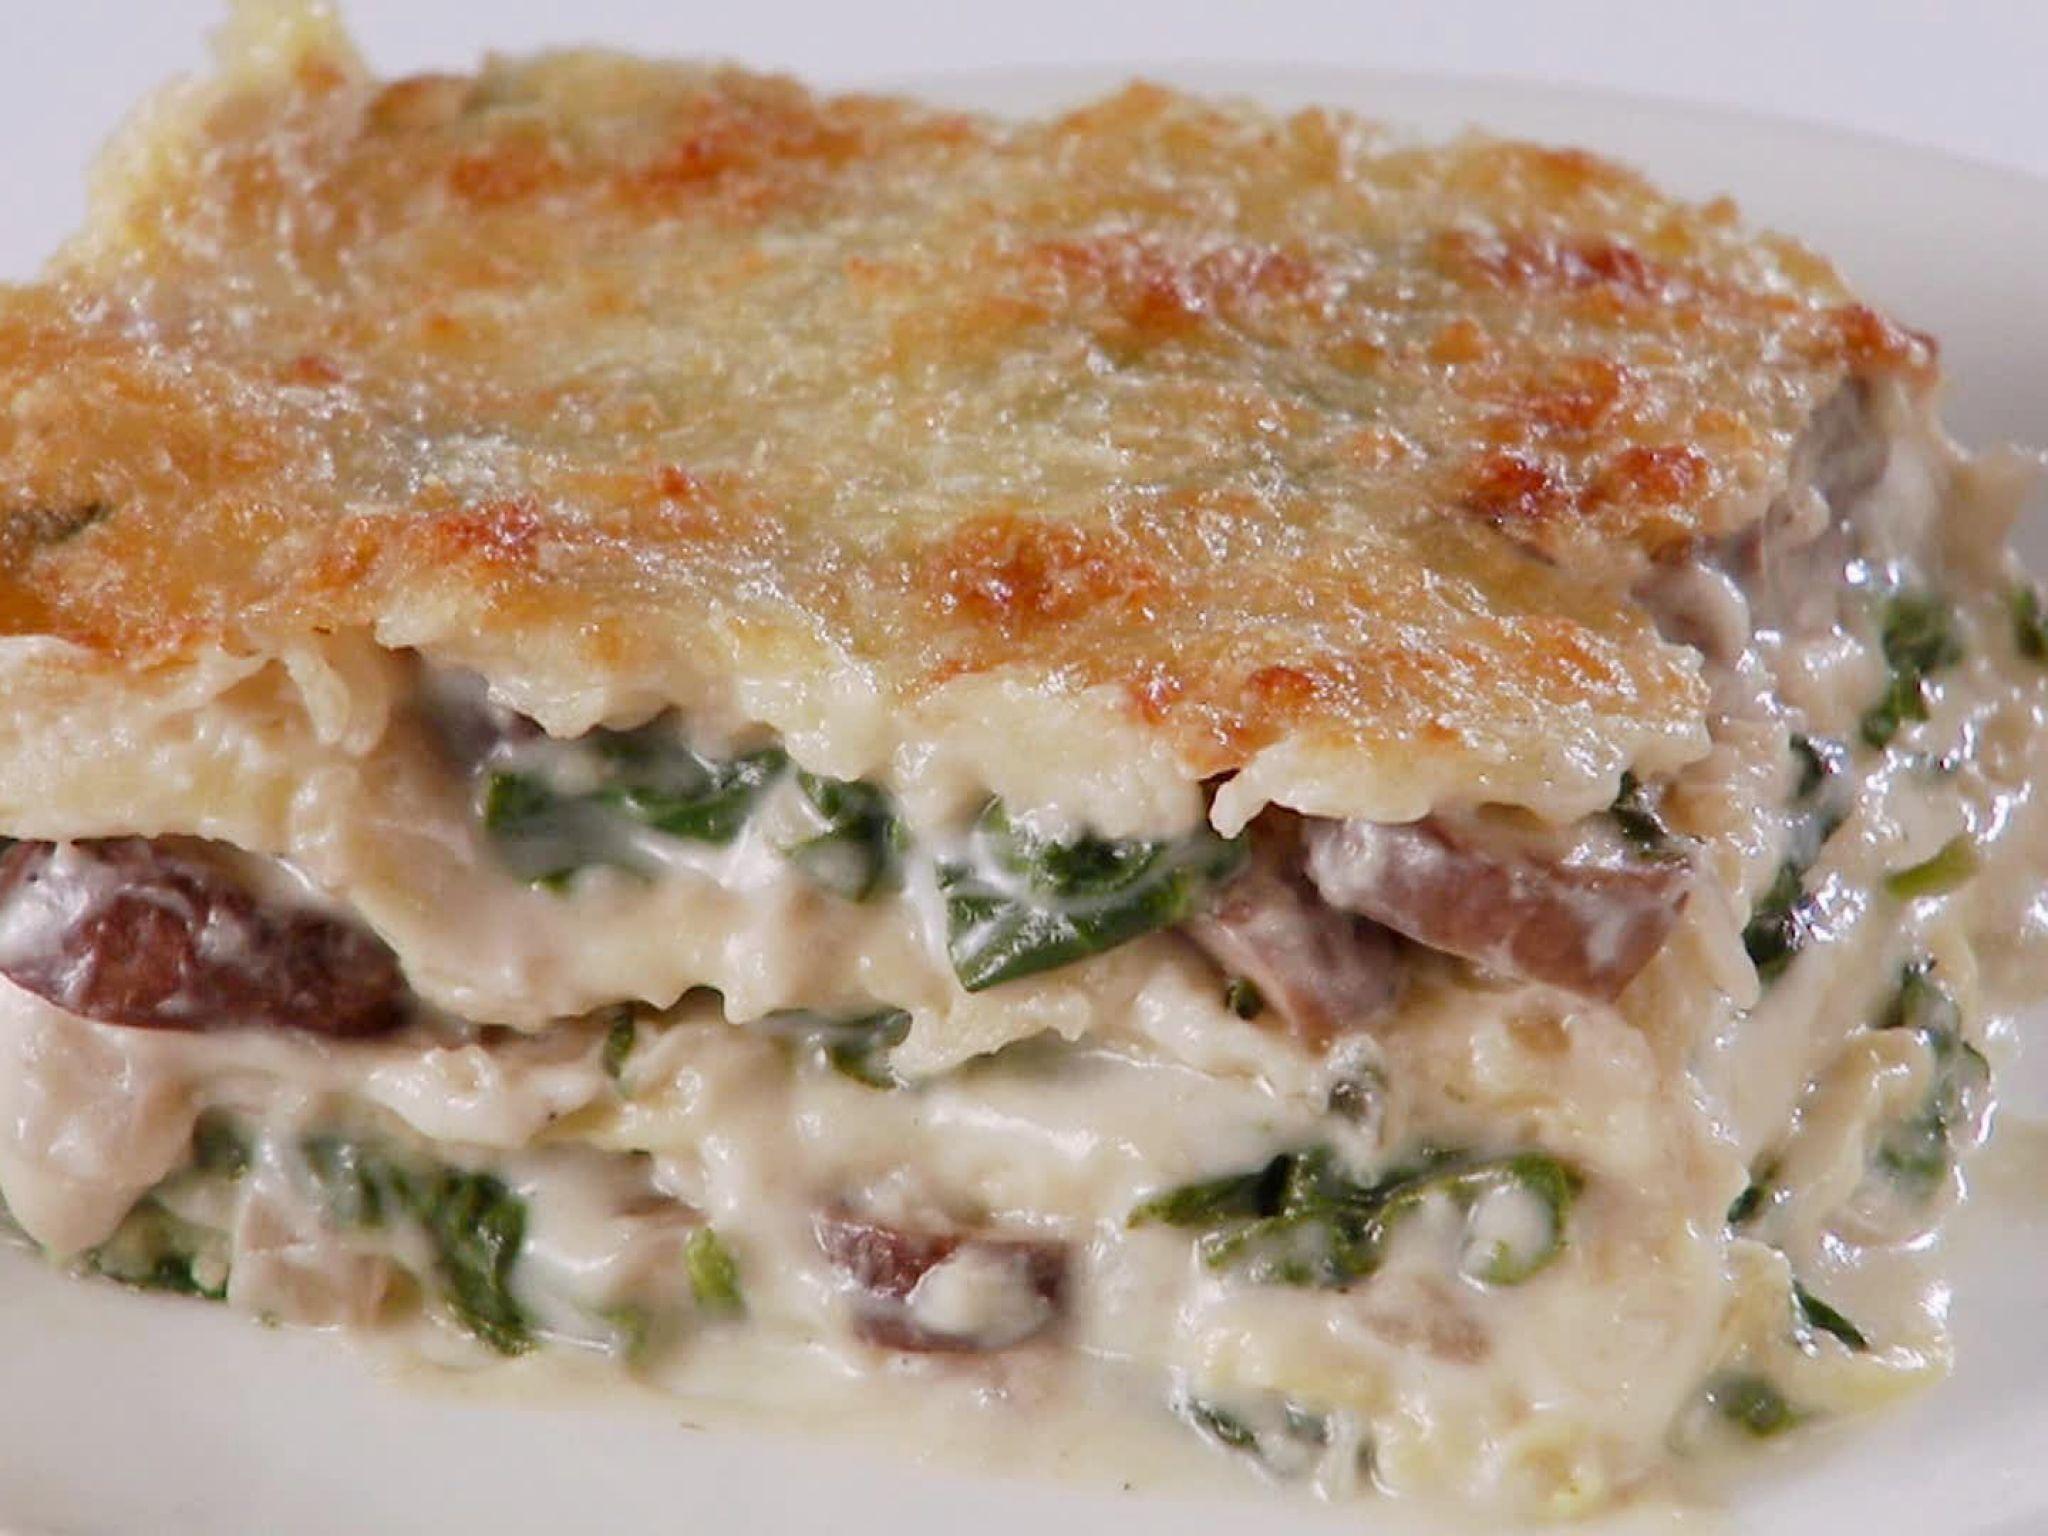 Creamy Spinach And Mushroom Lasagna Recipe Spinach Stuffed Mushrooms Spinach Mushroom Lasagna Food Network Recipes